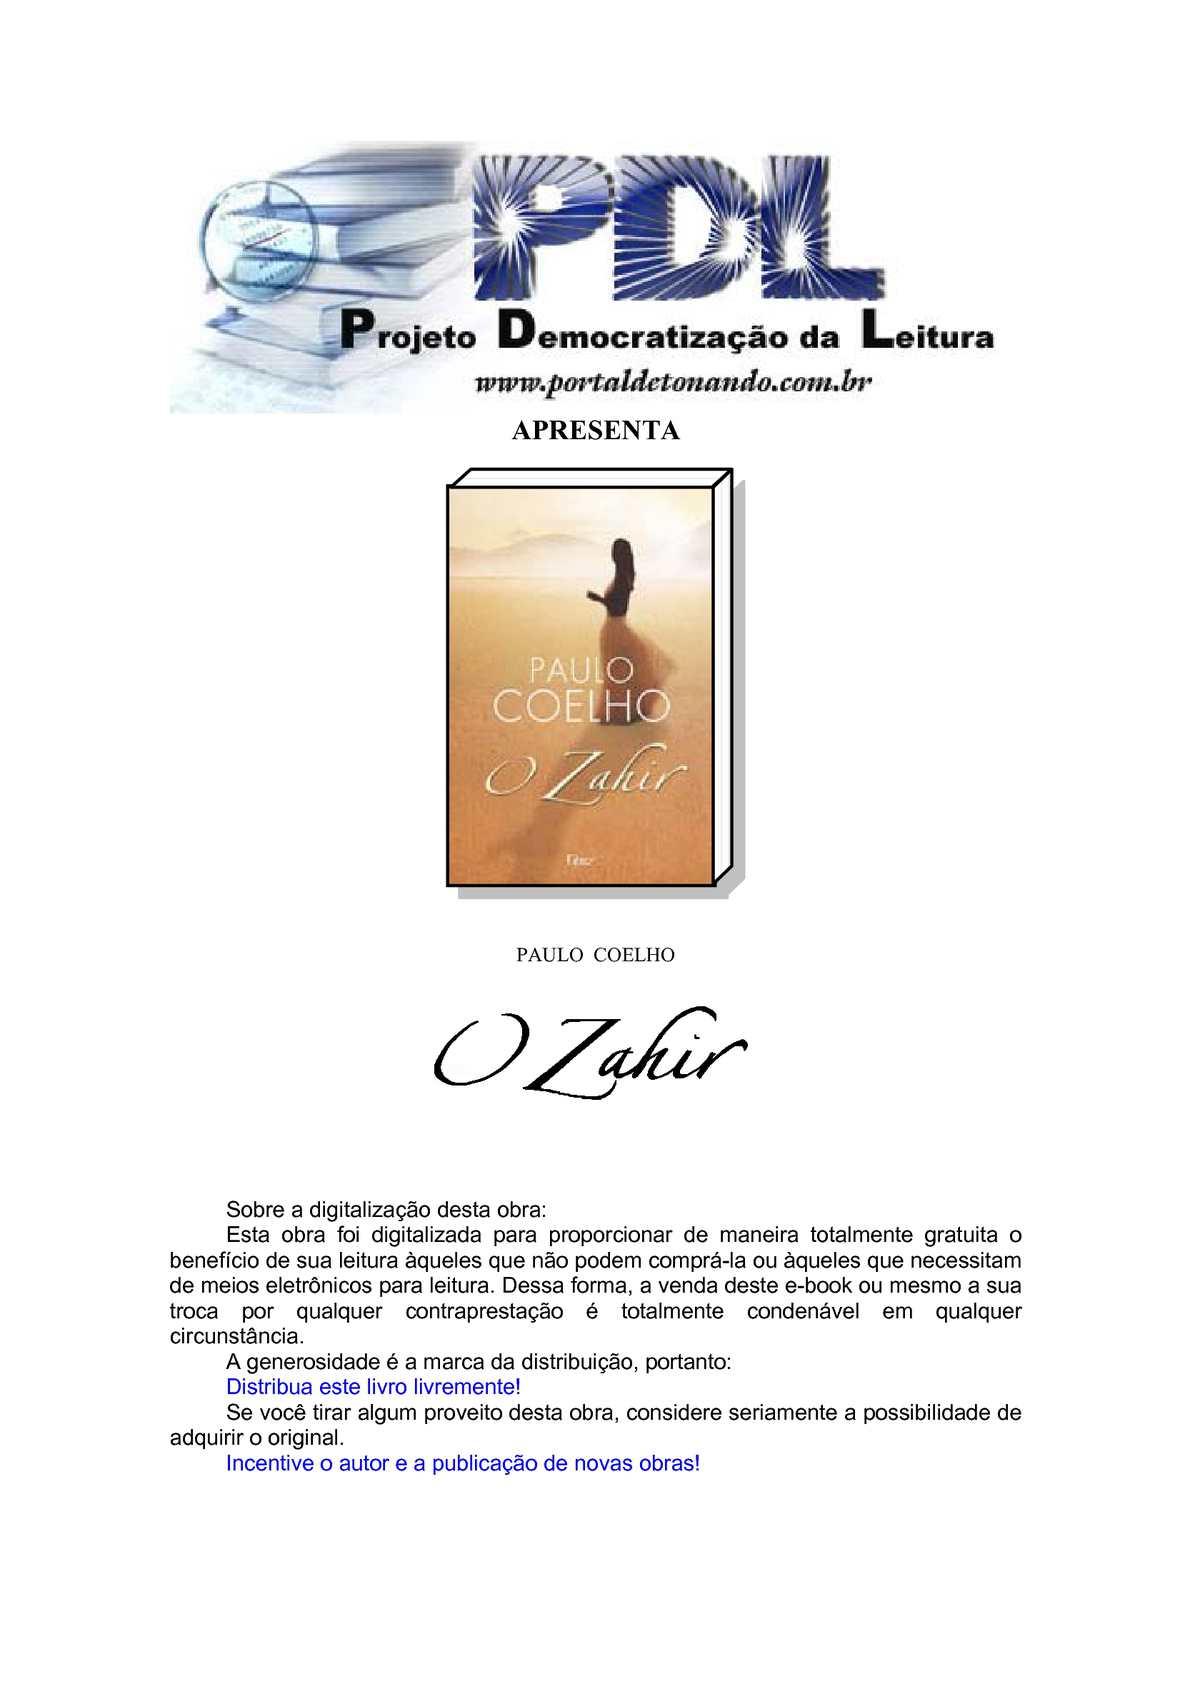 b67c98b5ca7 Calaméo - 2005 - O Zahir